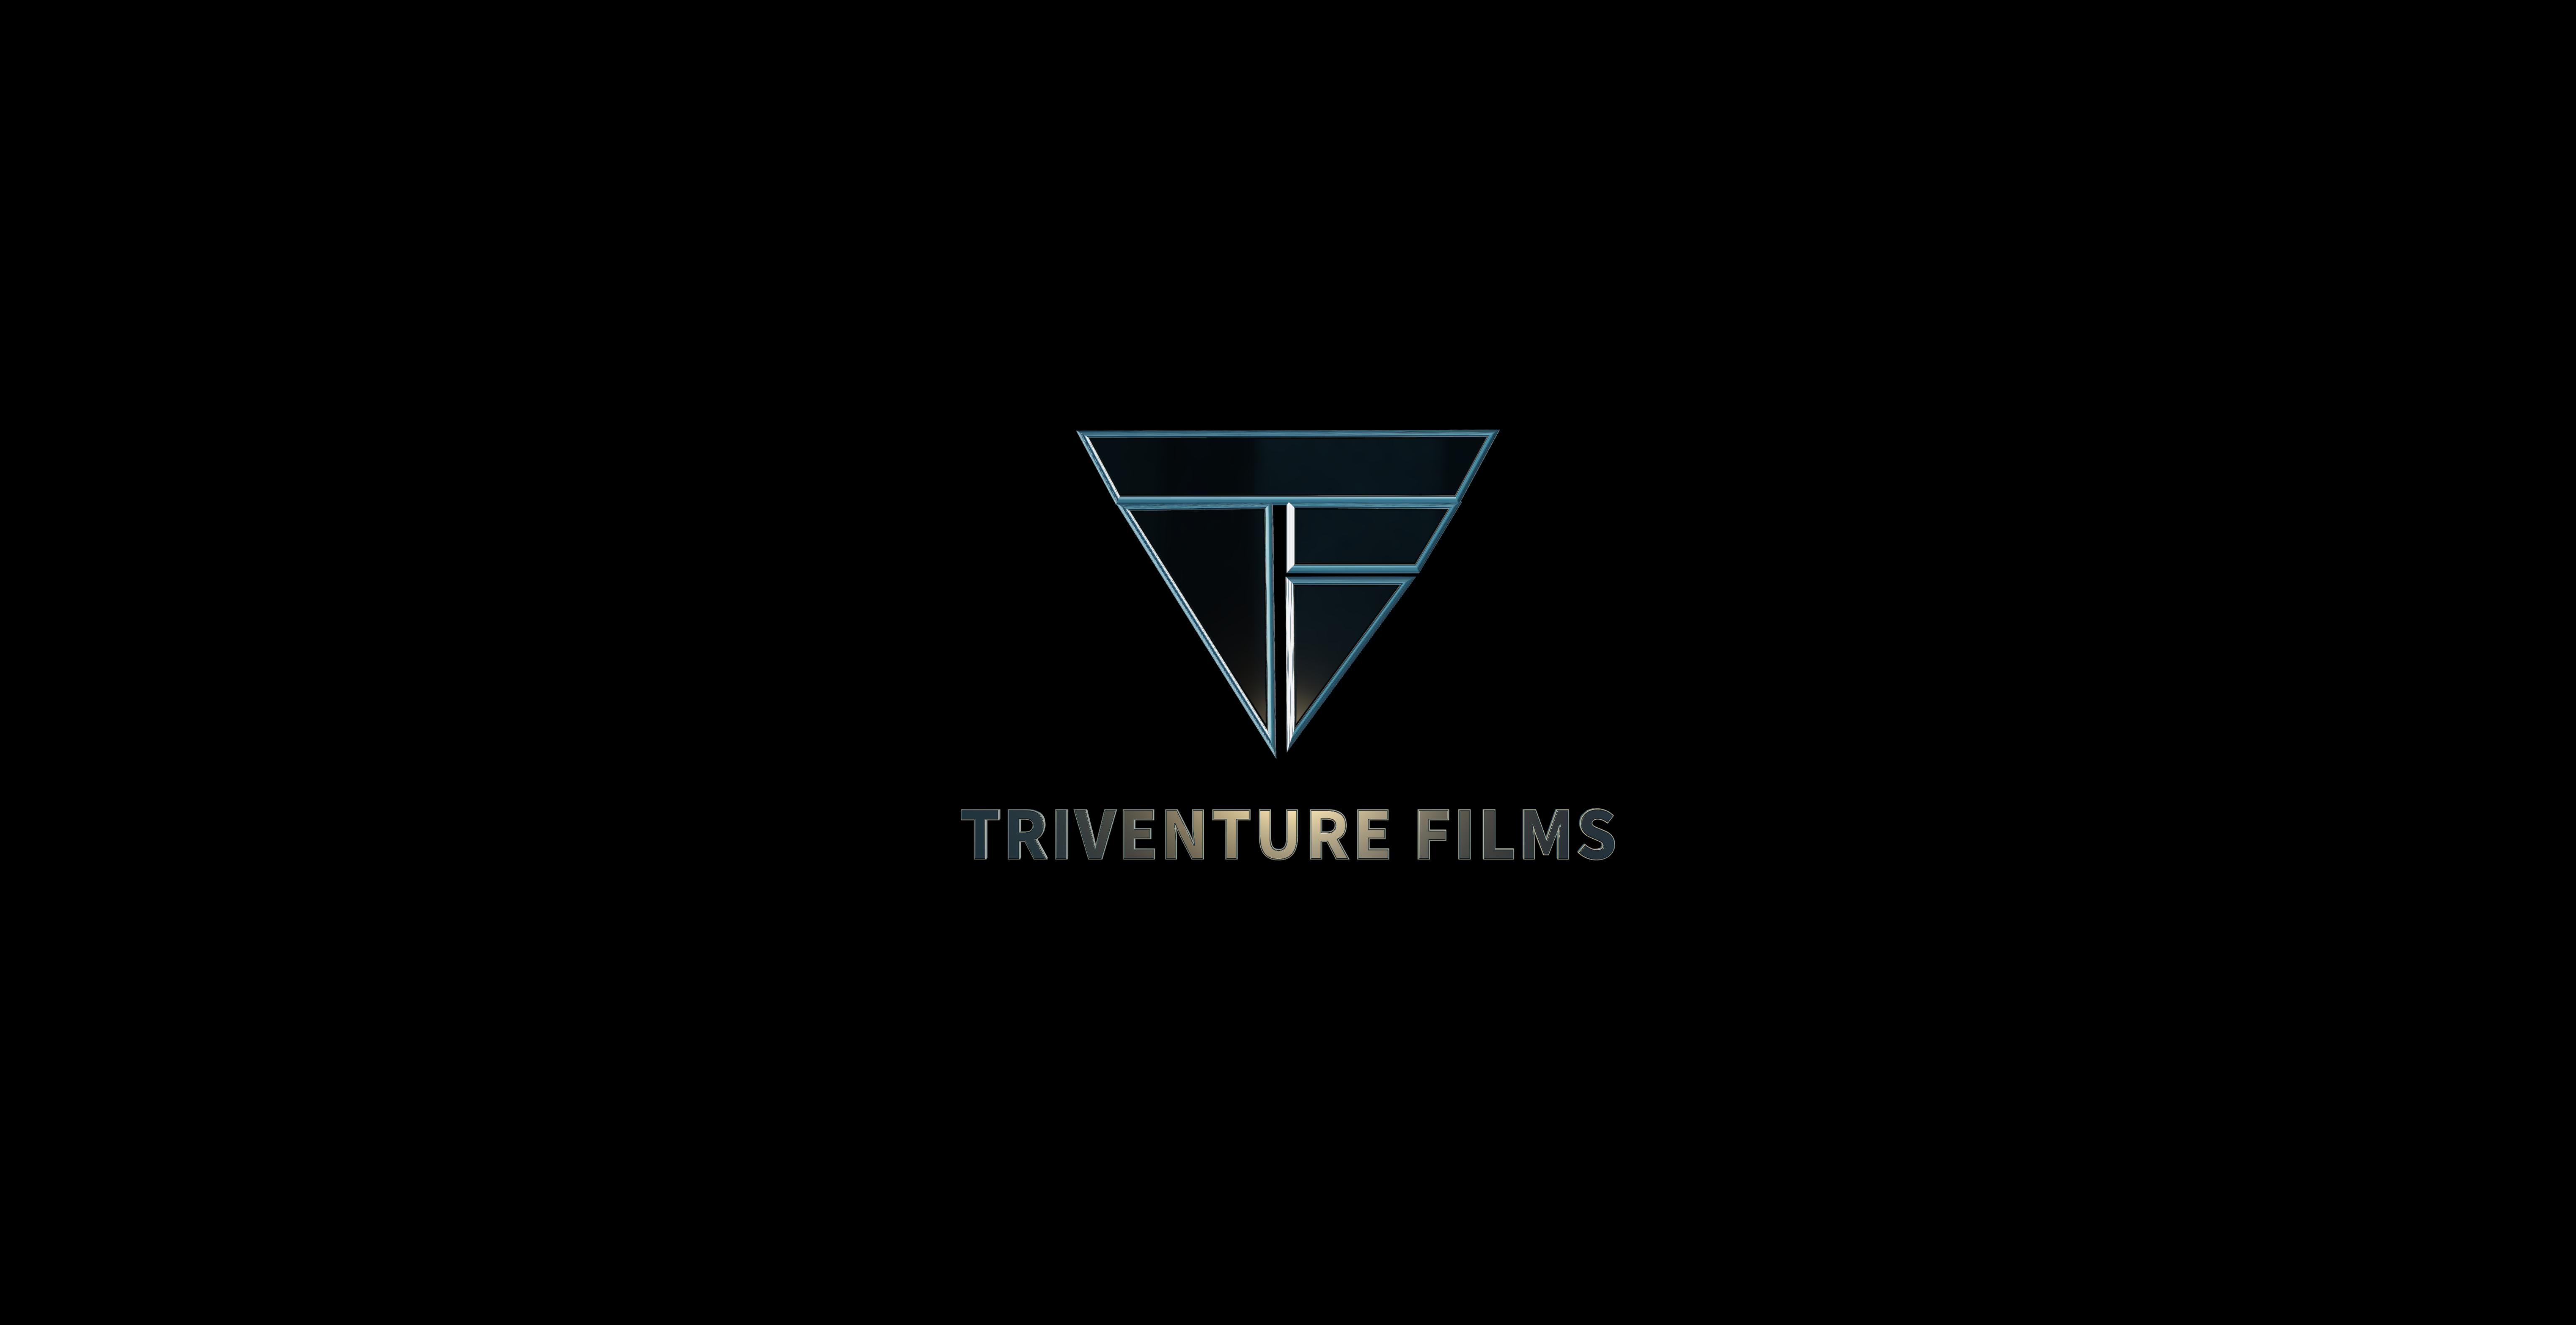 Triventure Films